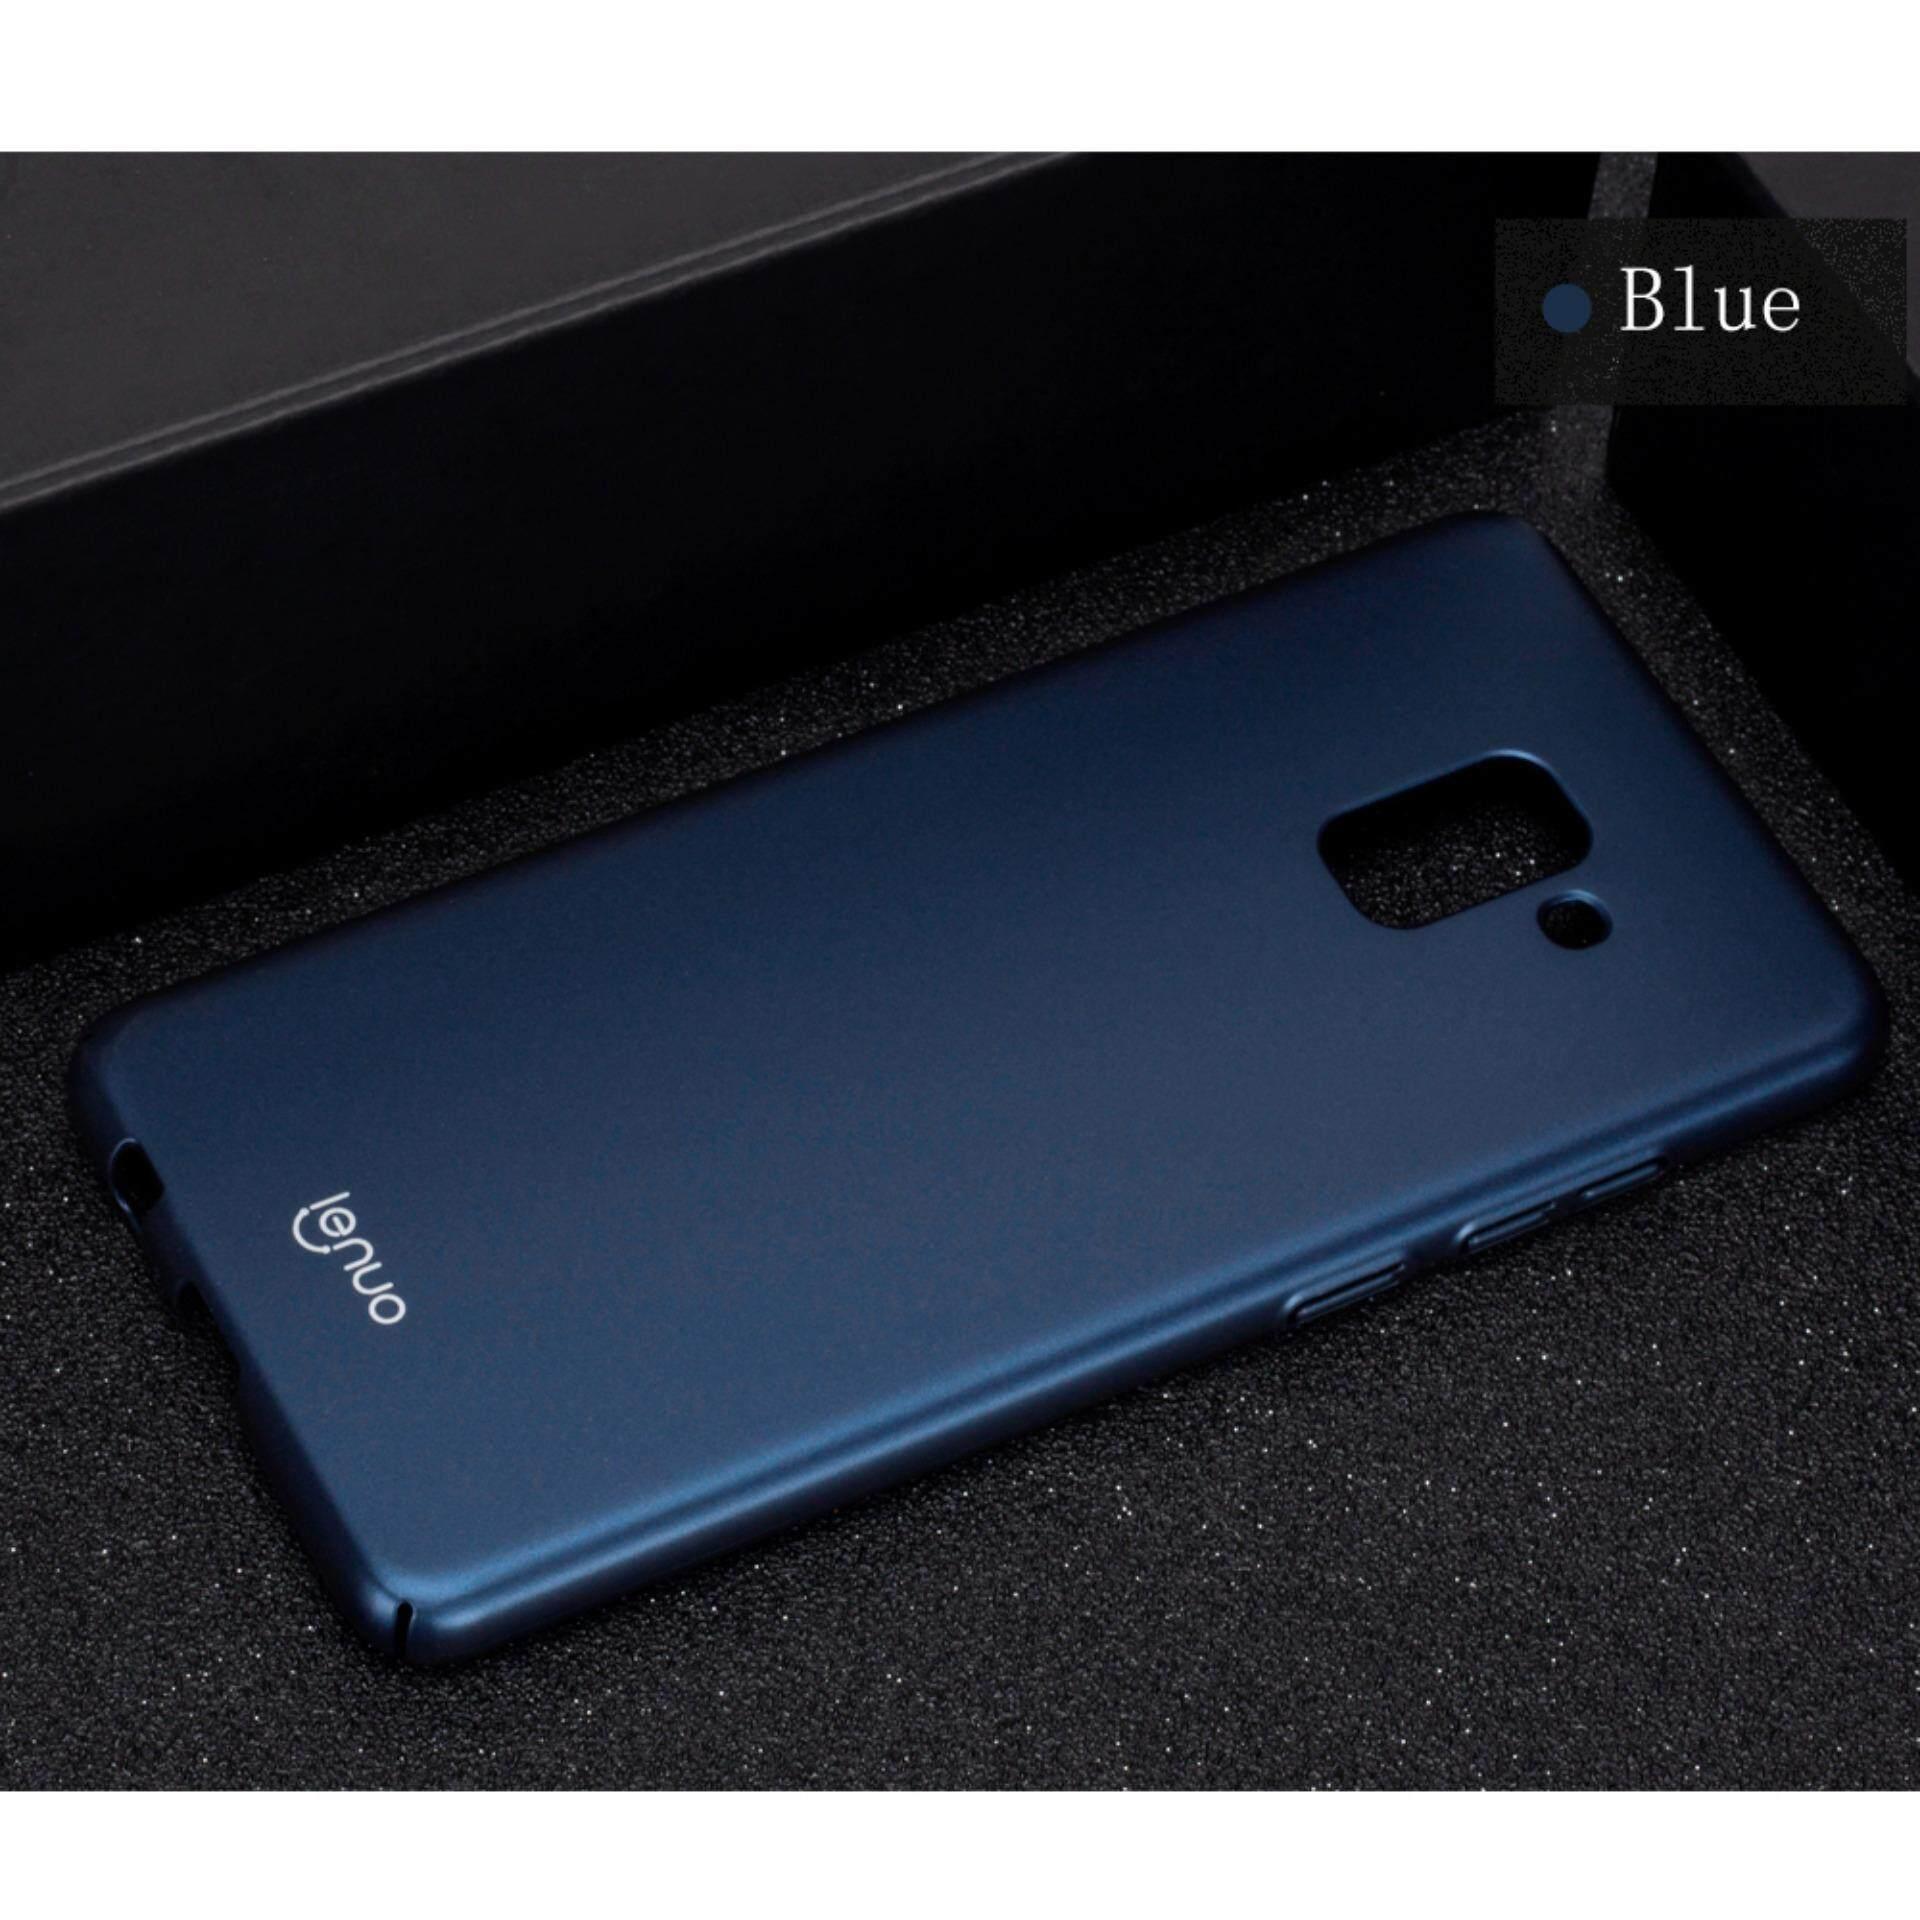 ... Lenuo Ledun PC Exact Fit Ultra Slim Thin Handy Shield Shell Hard Back Case Protective Cover